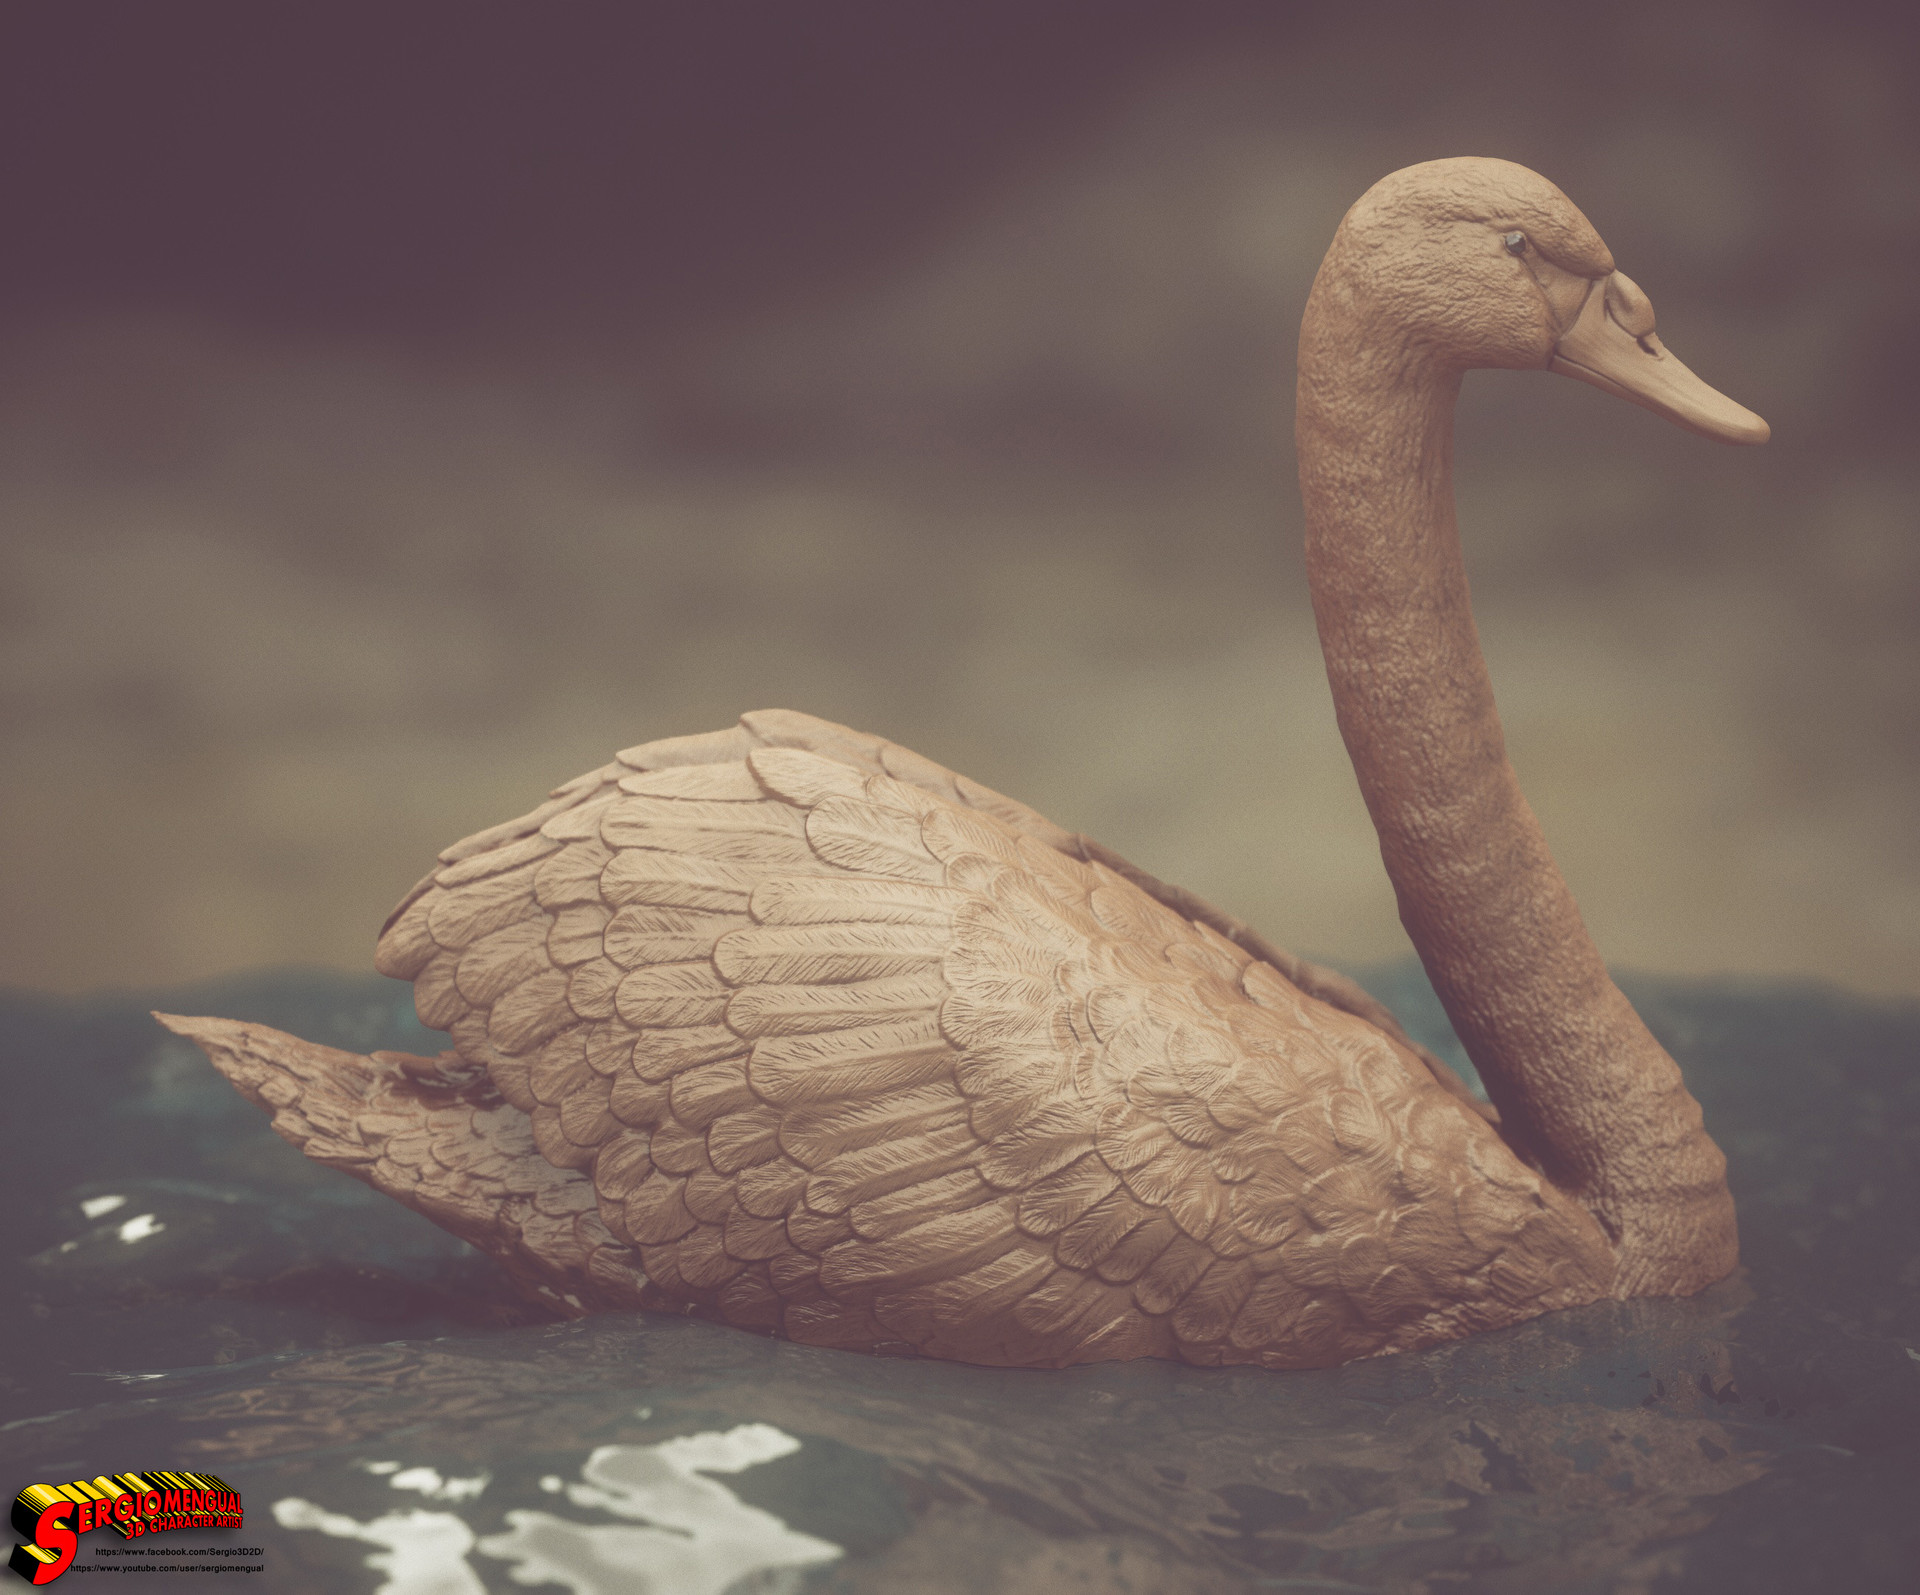 Sergio gabriel mengual swan square 6